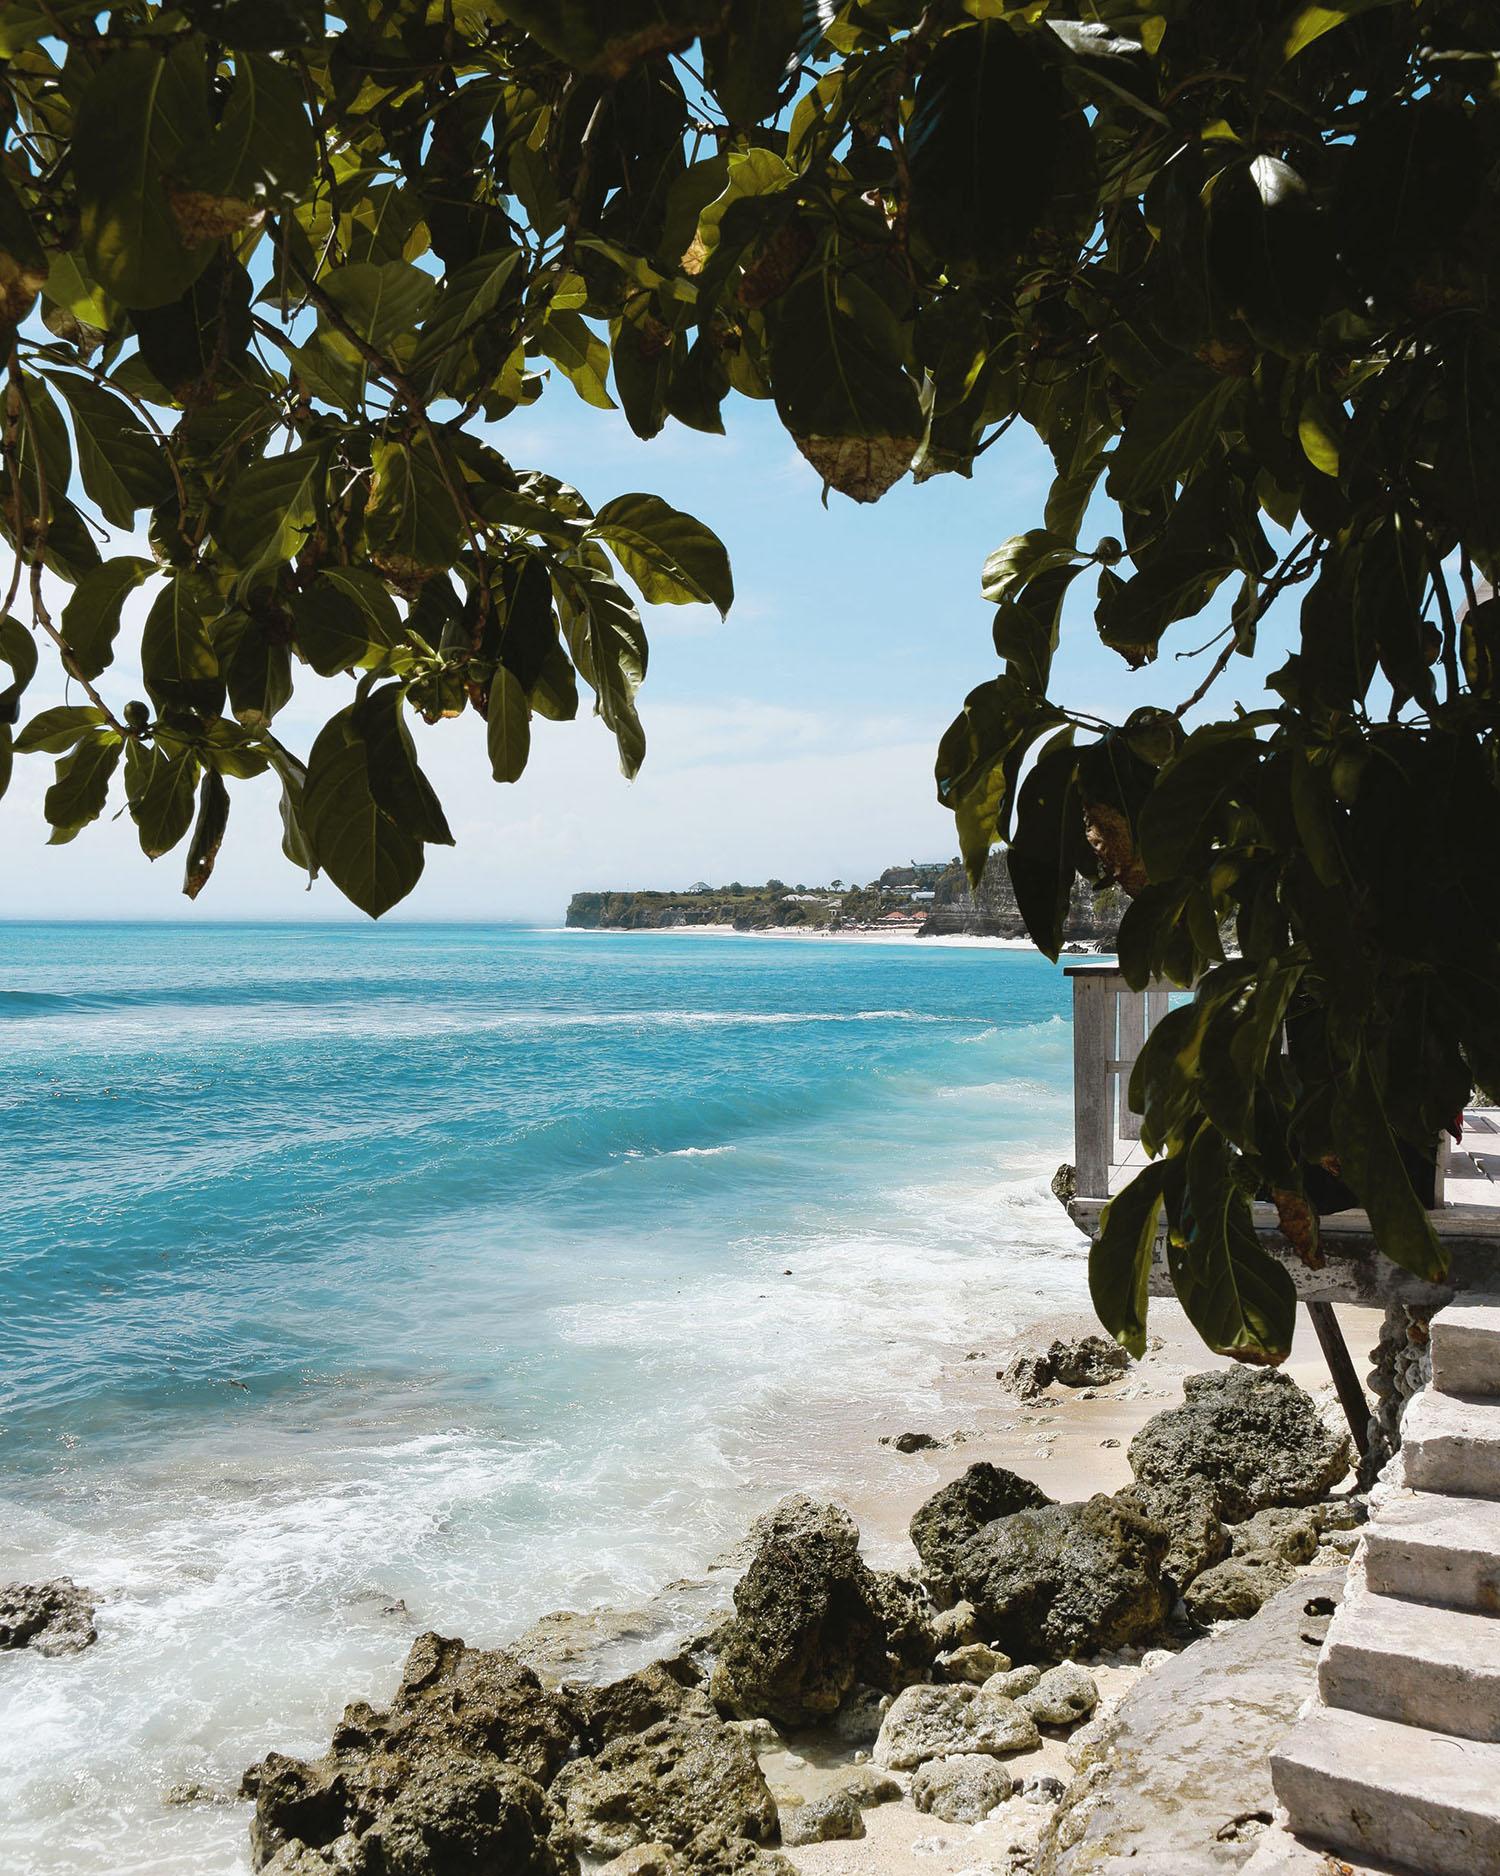 bali-guide-top-5-bali-beaches 03.jpg